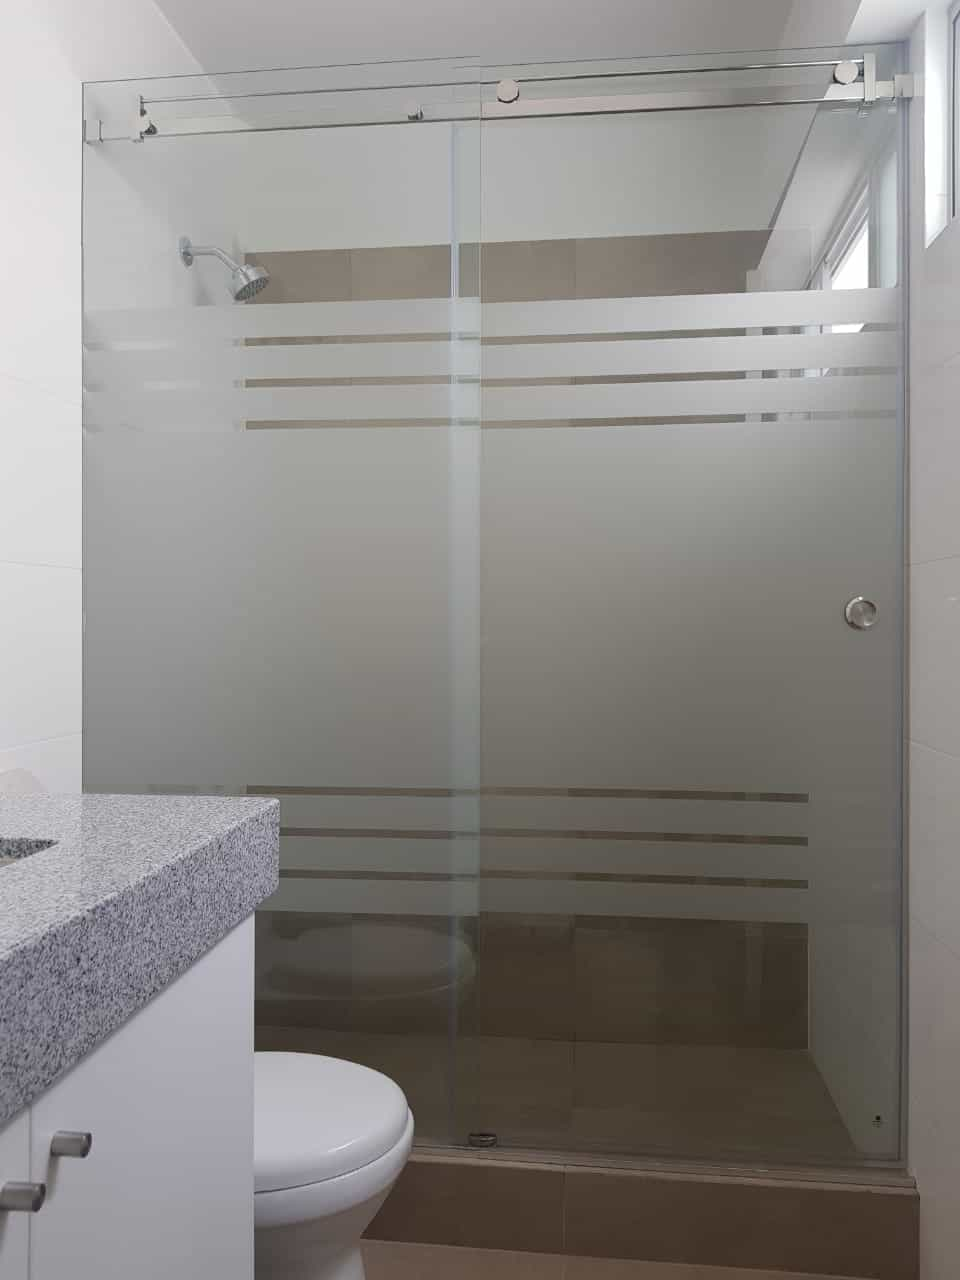 division de baño premiun 22 (2)